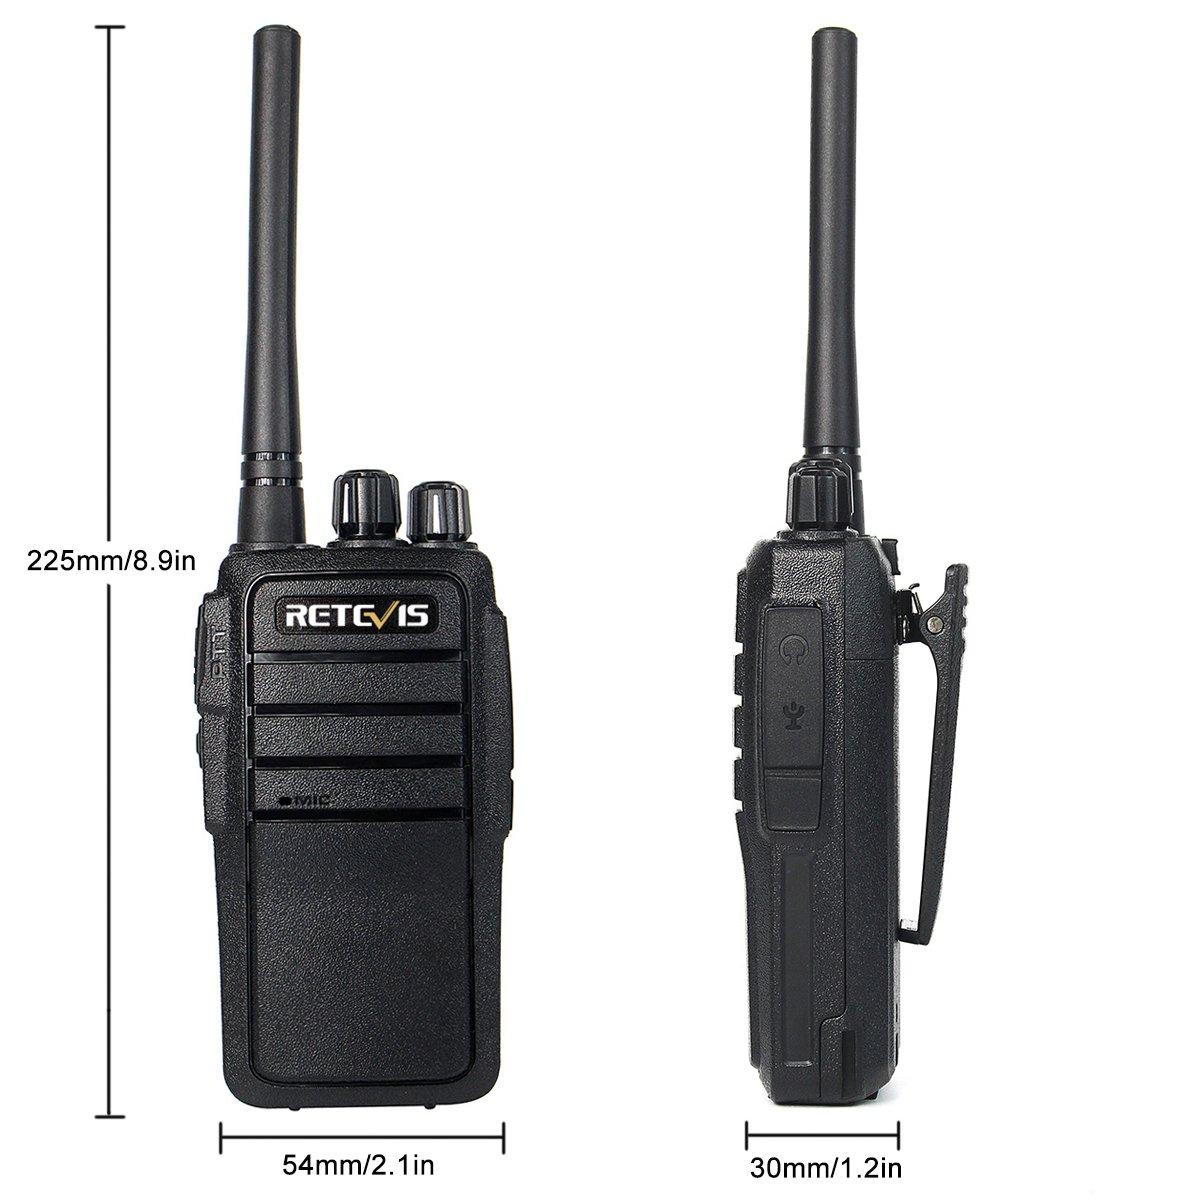 Retevis RT21 Two Way Radio Long Range Walkie Talkies Rechargeable Two Way Radios Long Range FRS Radio UHf Radio 2 Way Radios Walkie Talkies with 5-Port USB Charger 5687E58B18DDA53E 5 Pack